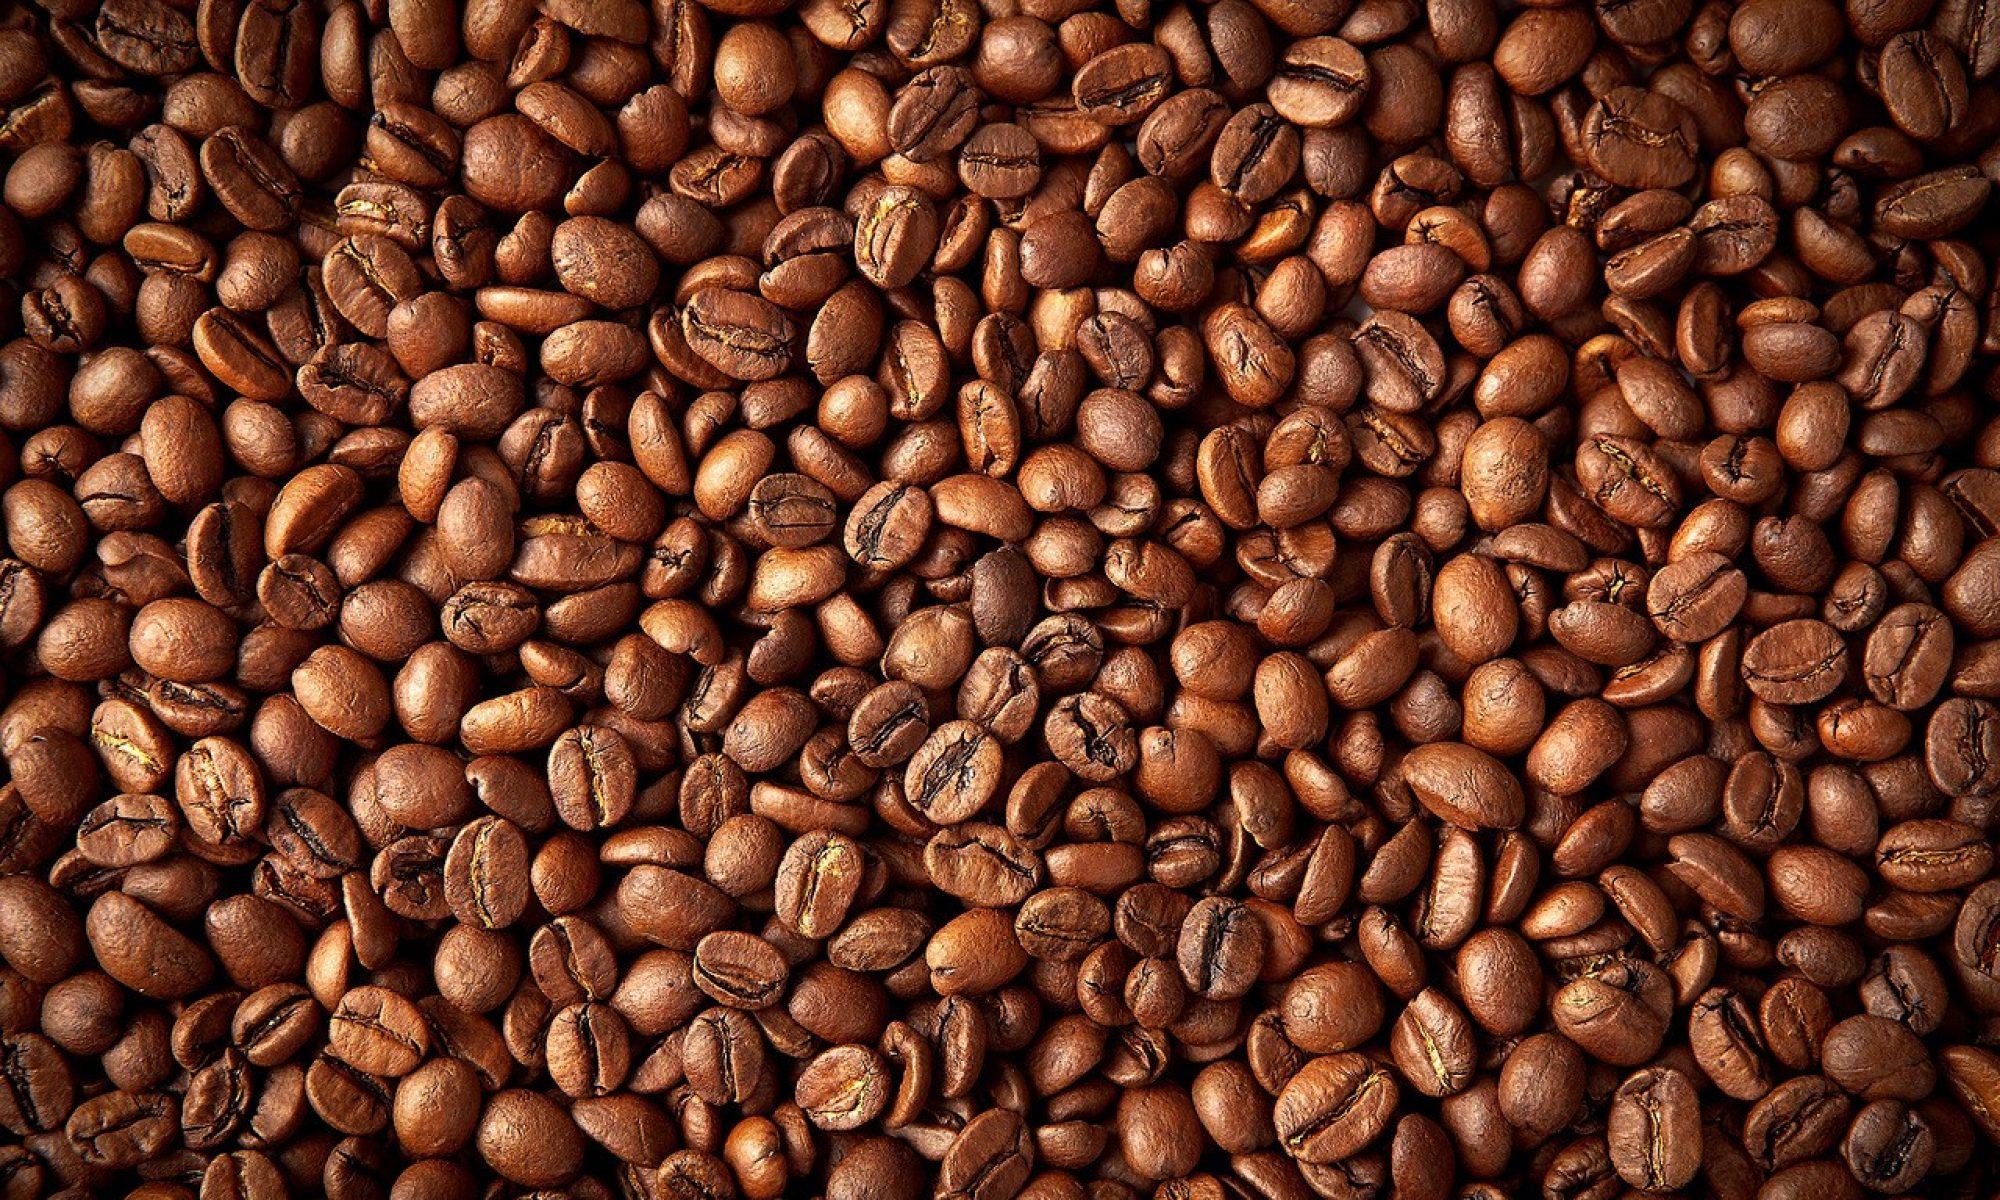 Diacoffee